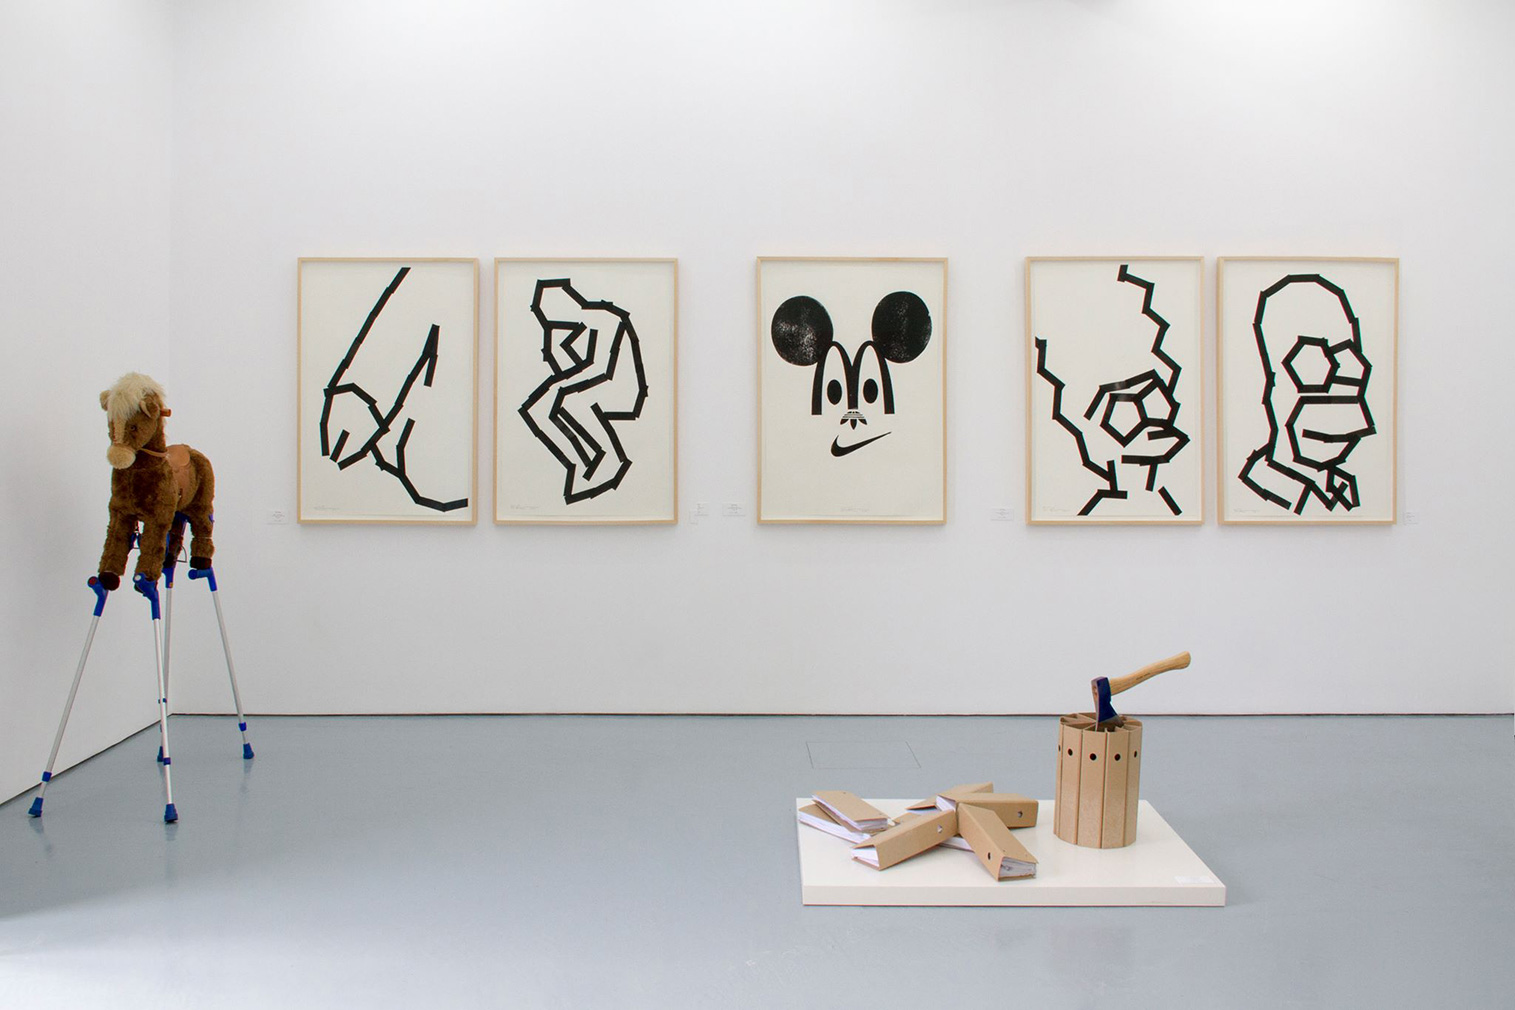 Ainori gallery in Lisbon